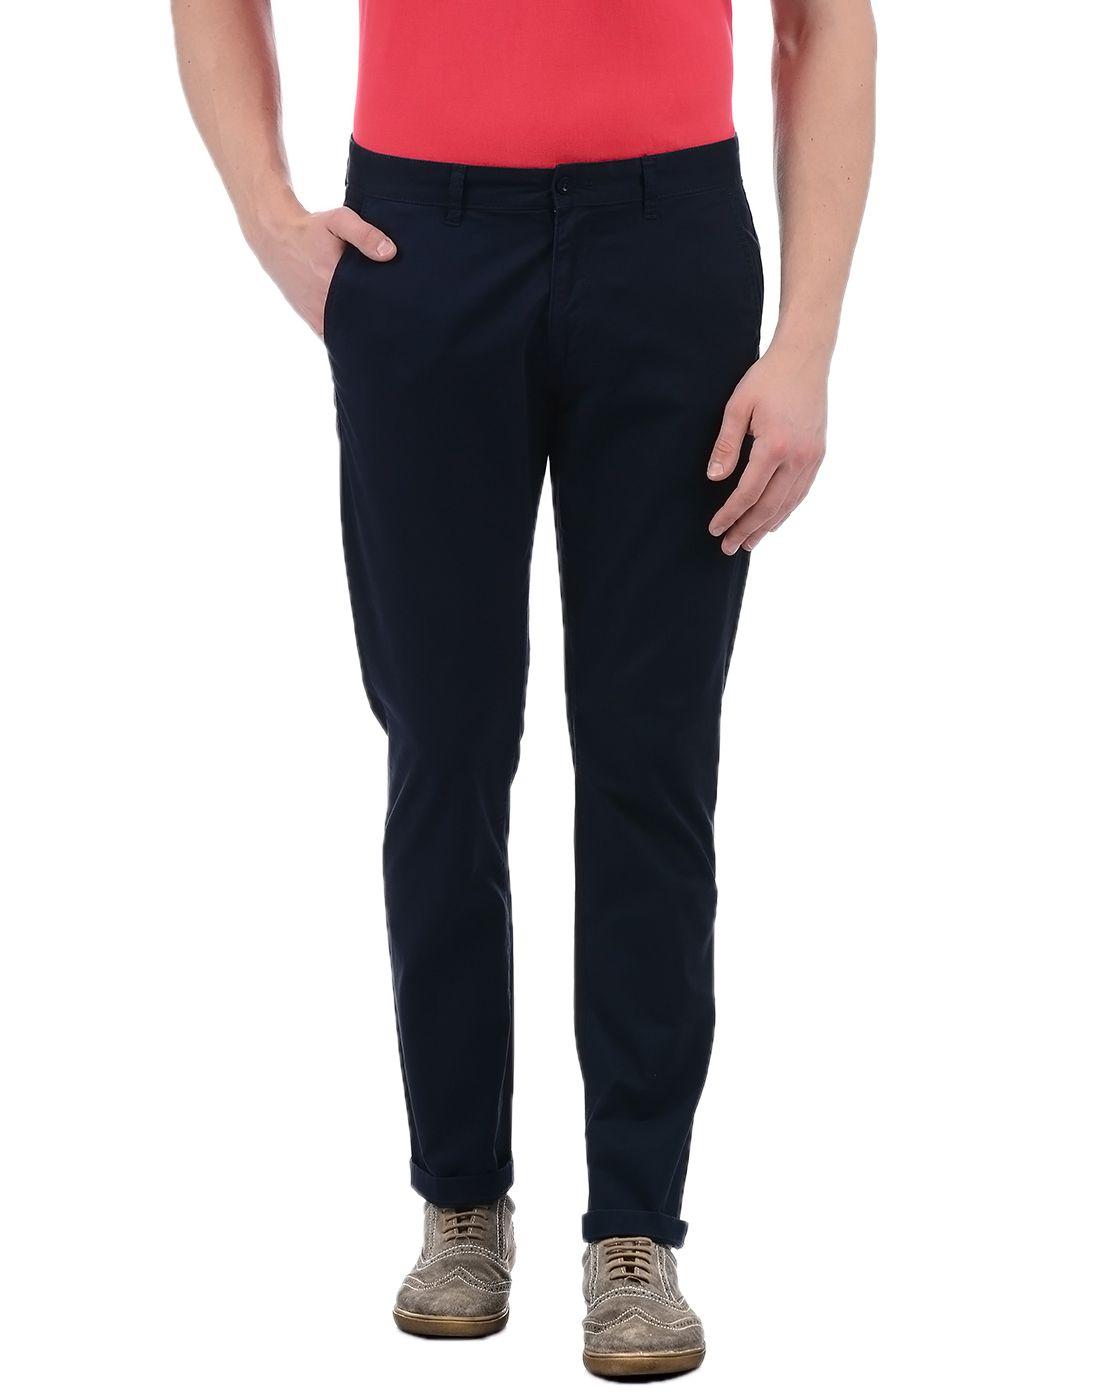 Izod Blue Slim -Fit Flat Chinos